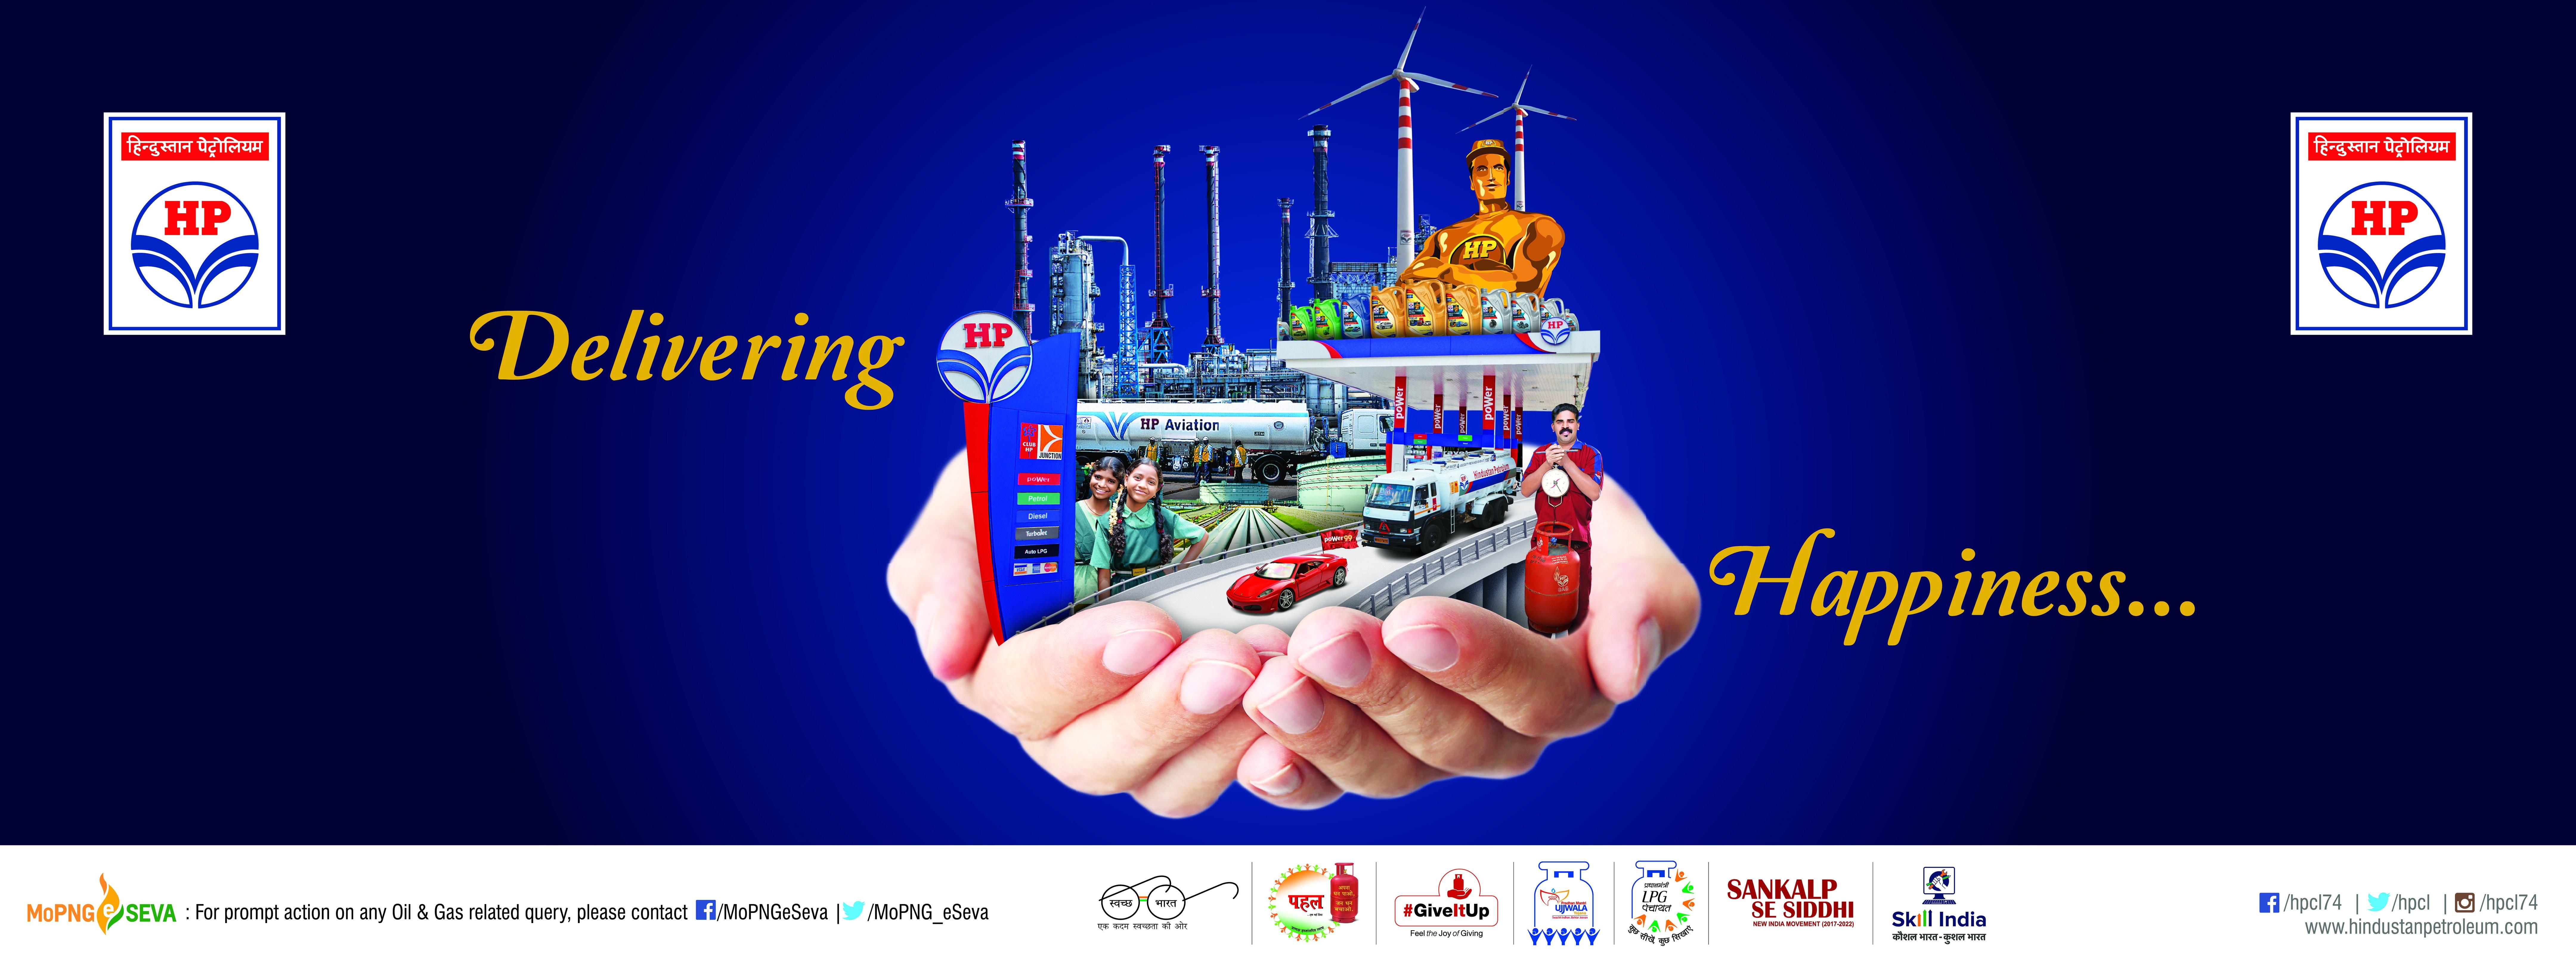 Hindustan Petroleum Corporation Limited   LinkedIn